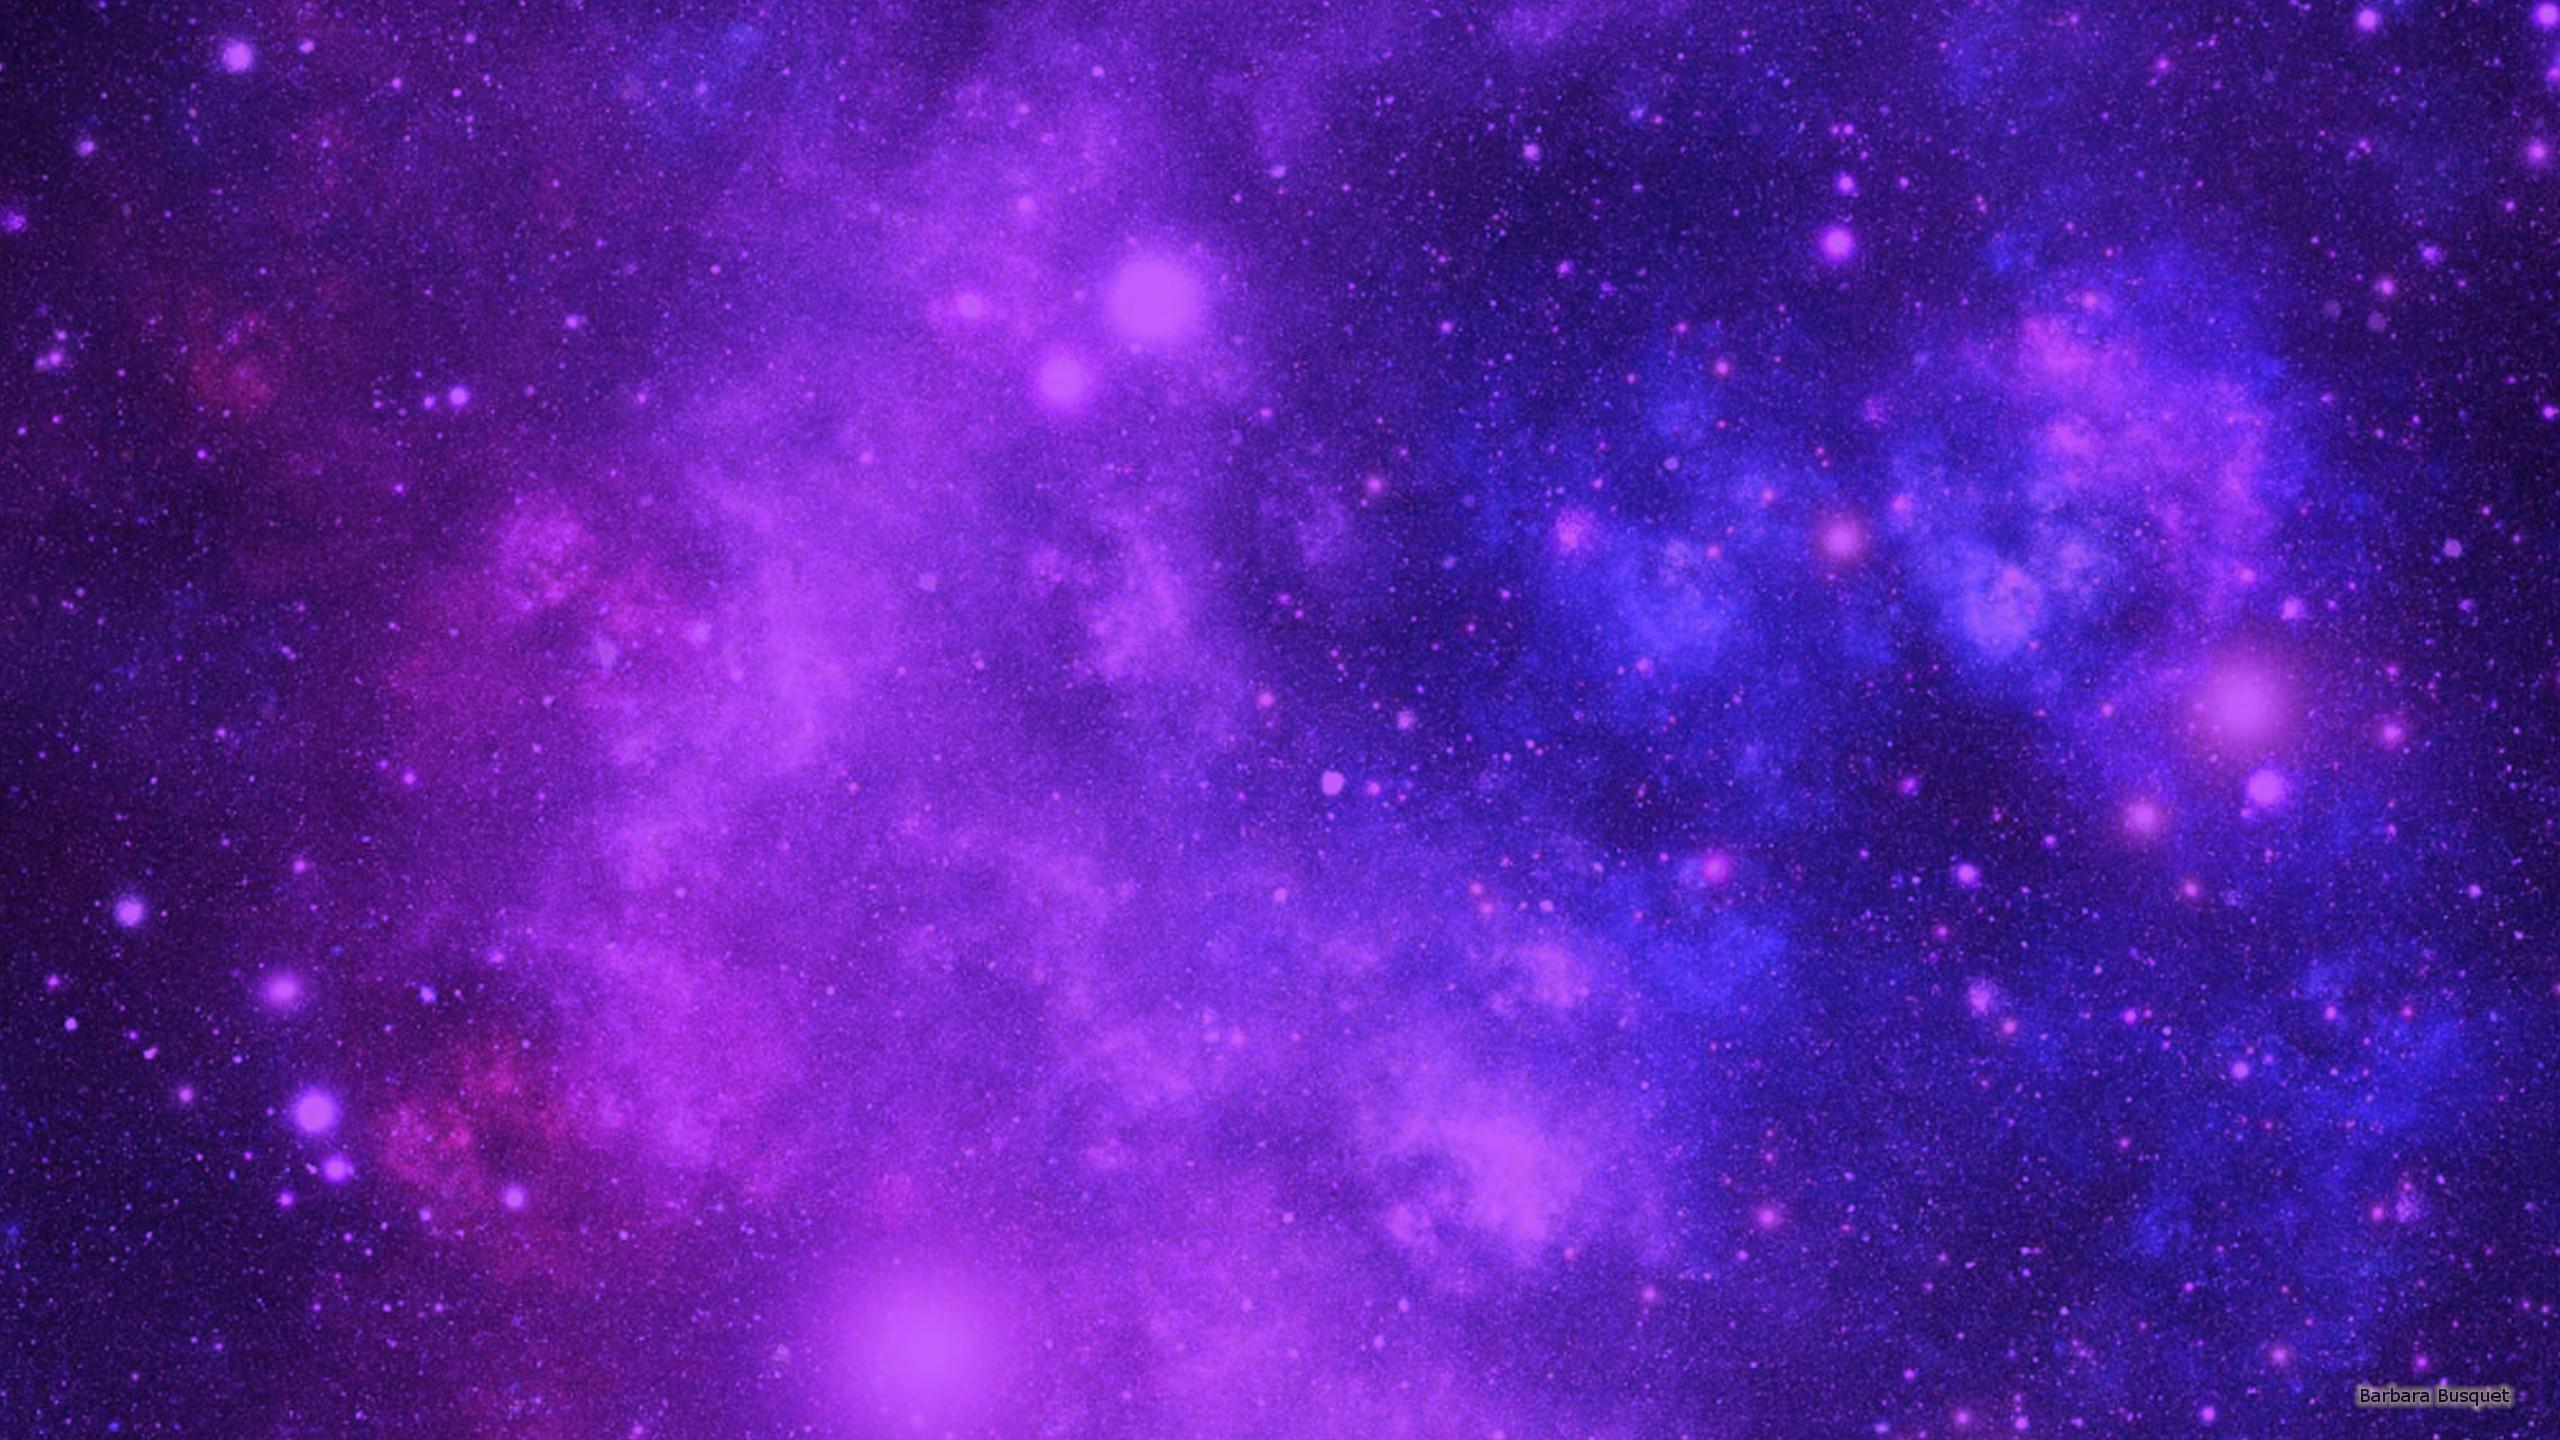 Galaxy Wallpapers   Barbaras HD Wallpapers 2560x1440